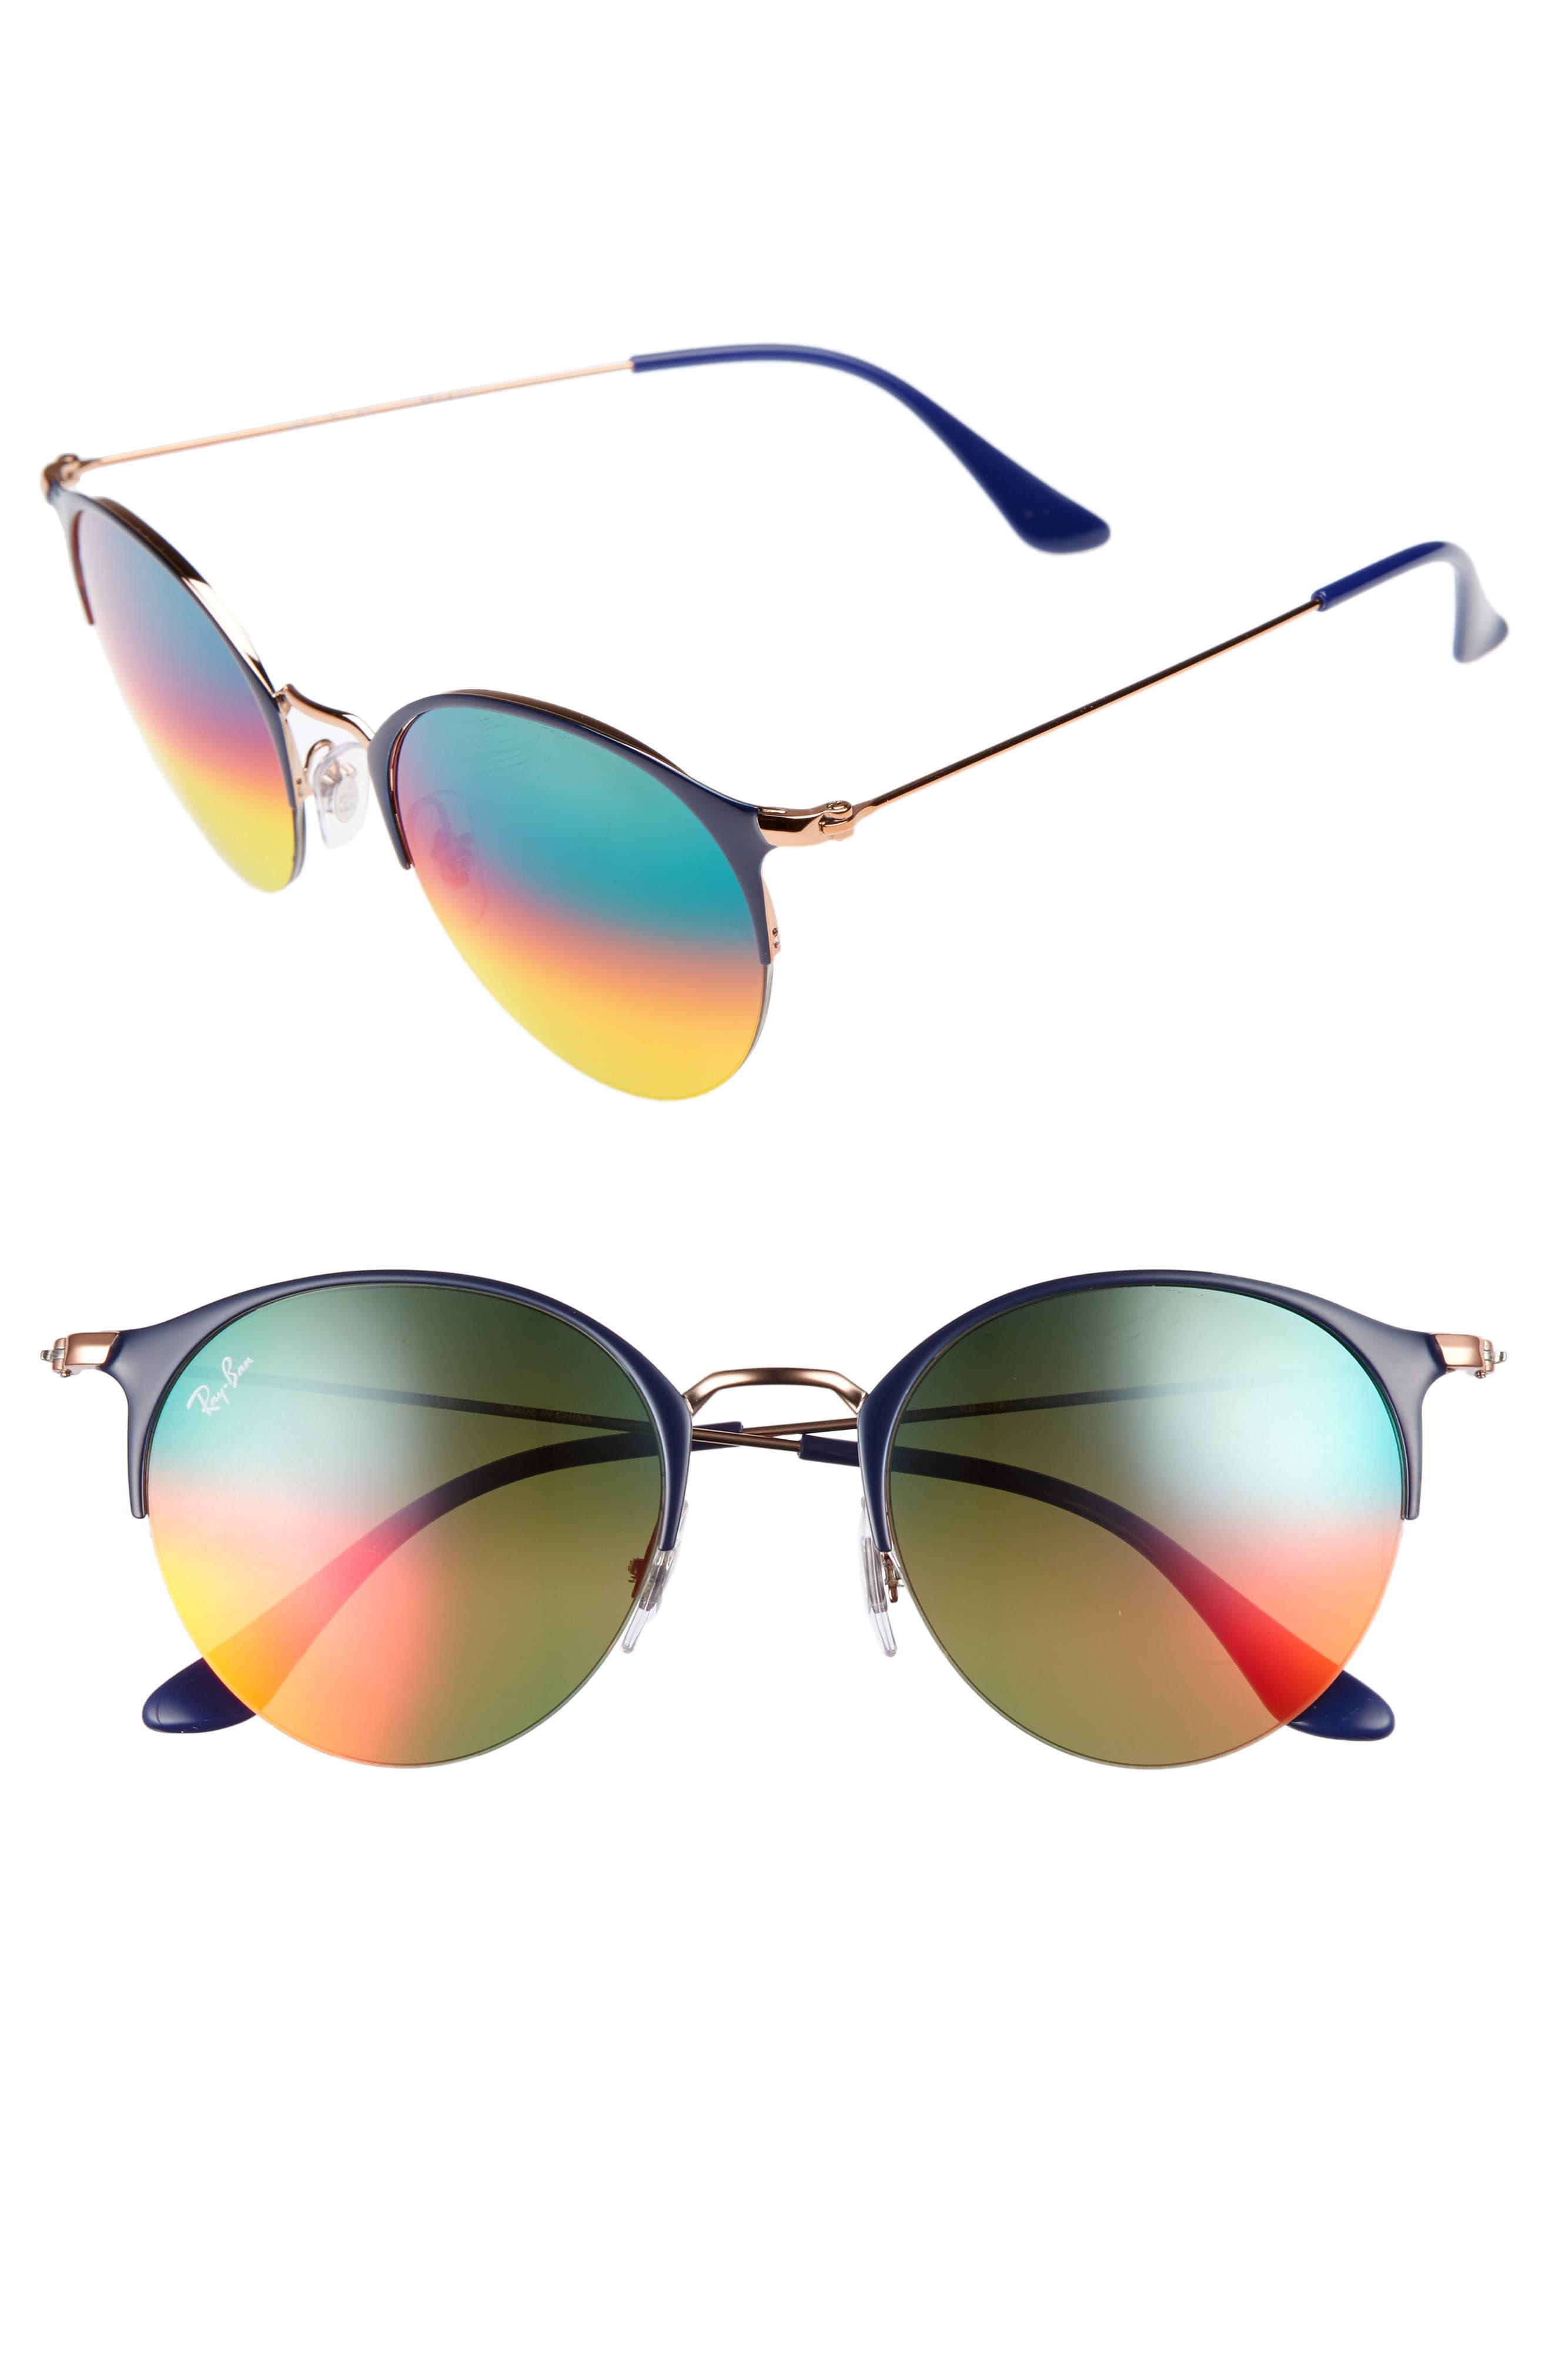 Ray-Ban 50mm Gradient Mirrored Sunglasses